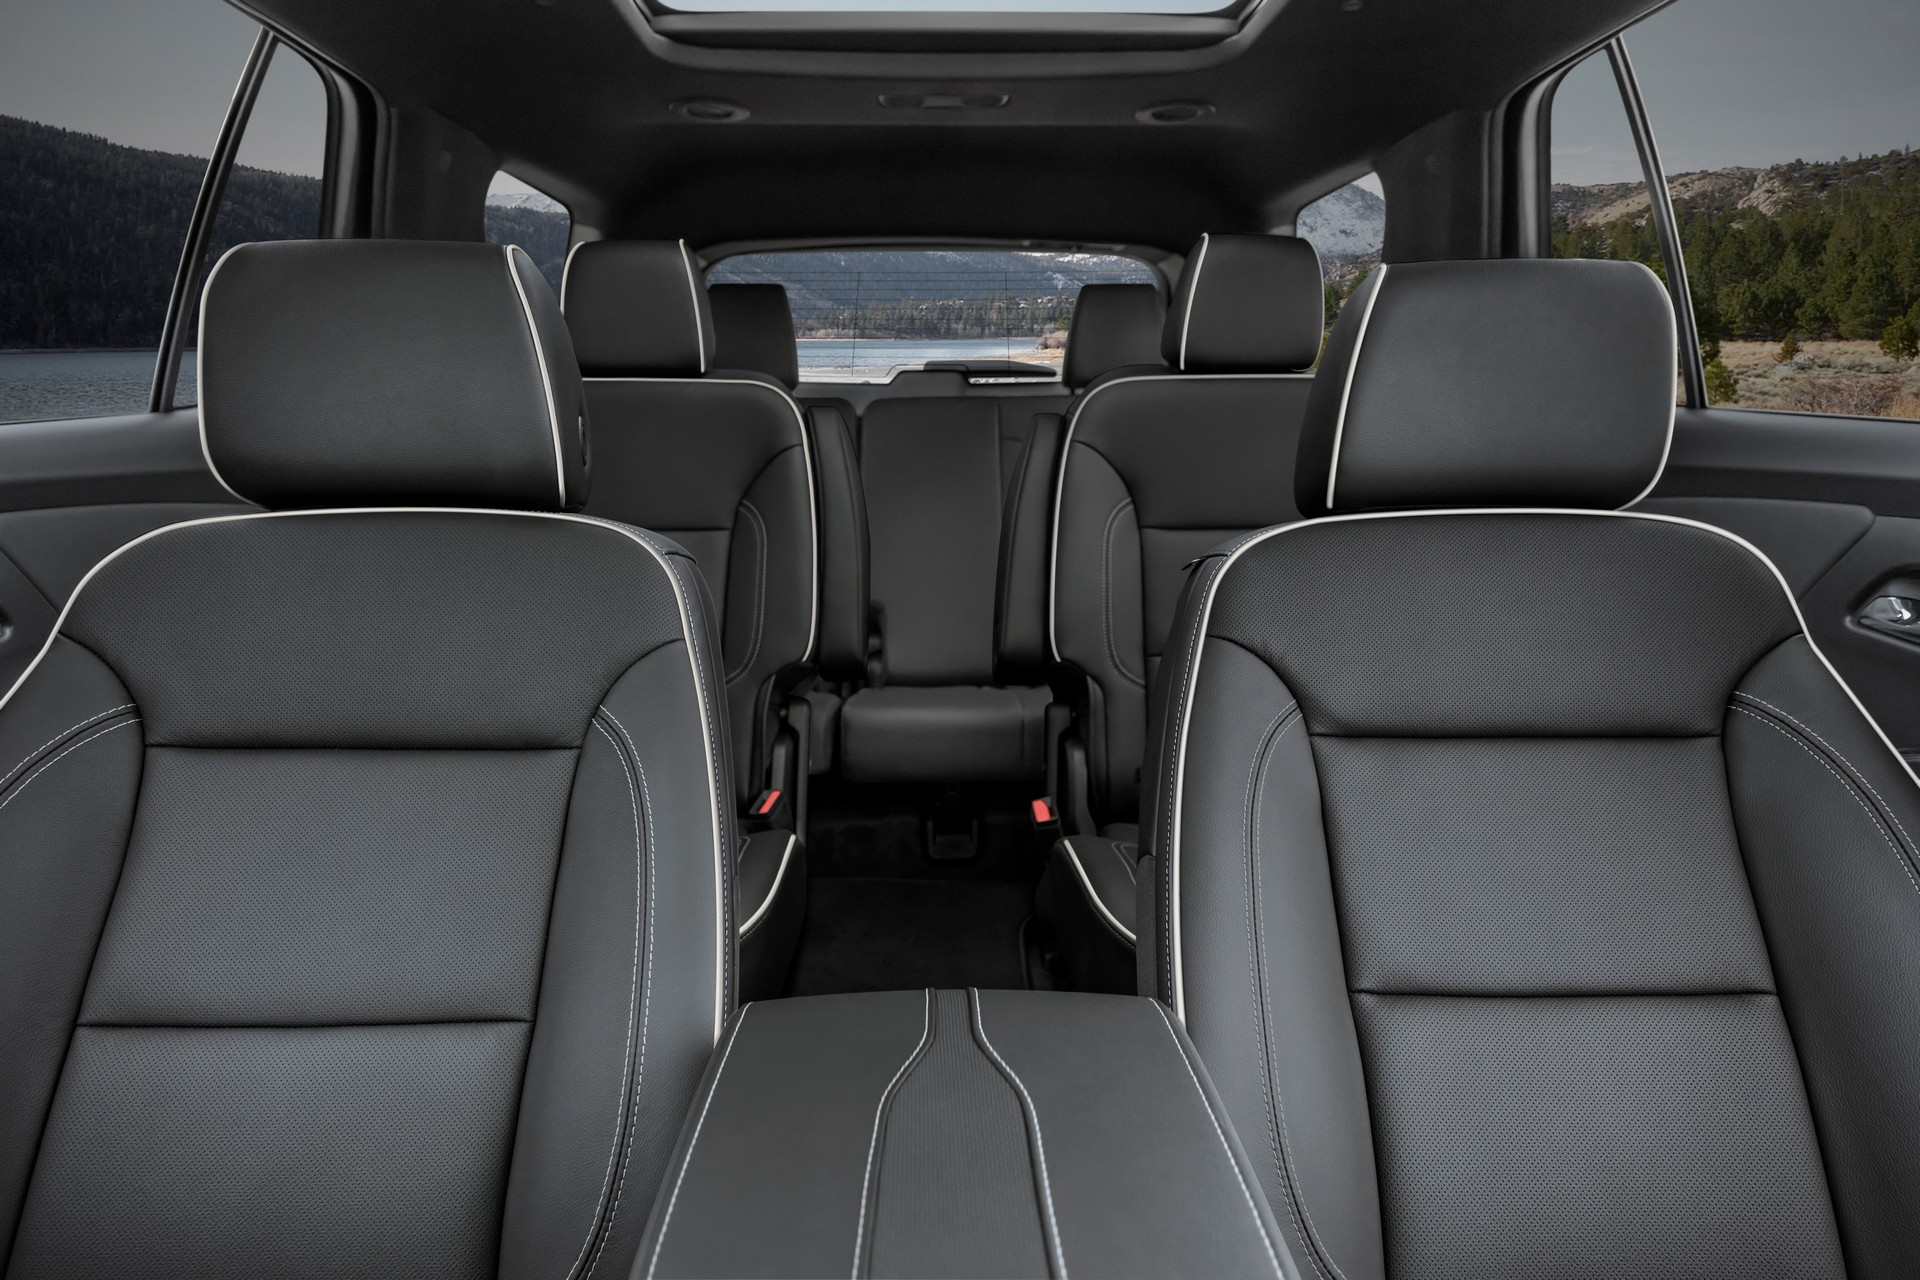 2021-Chevrolet-Traverse-18